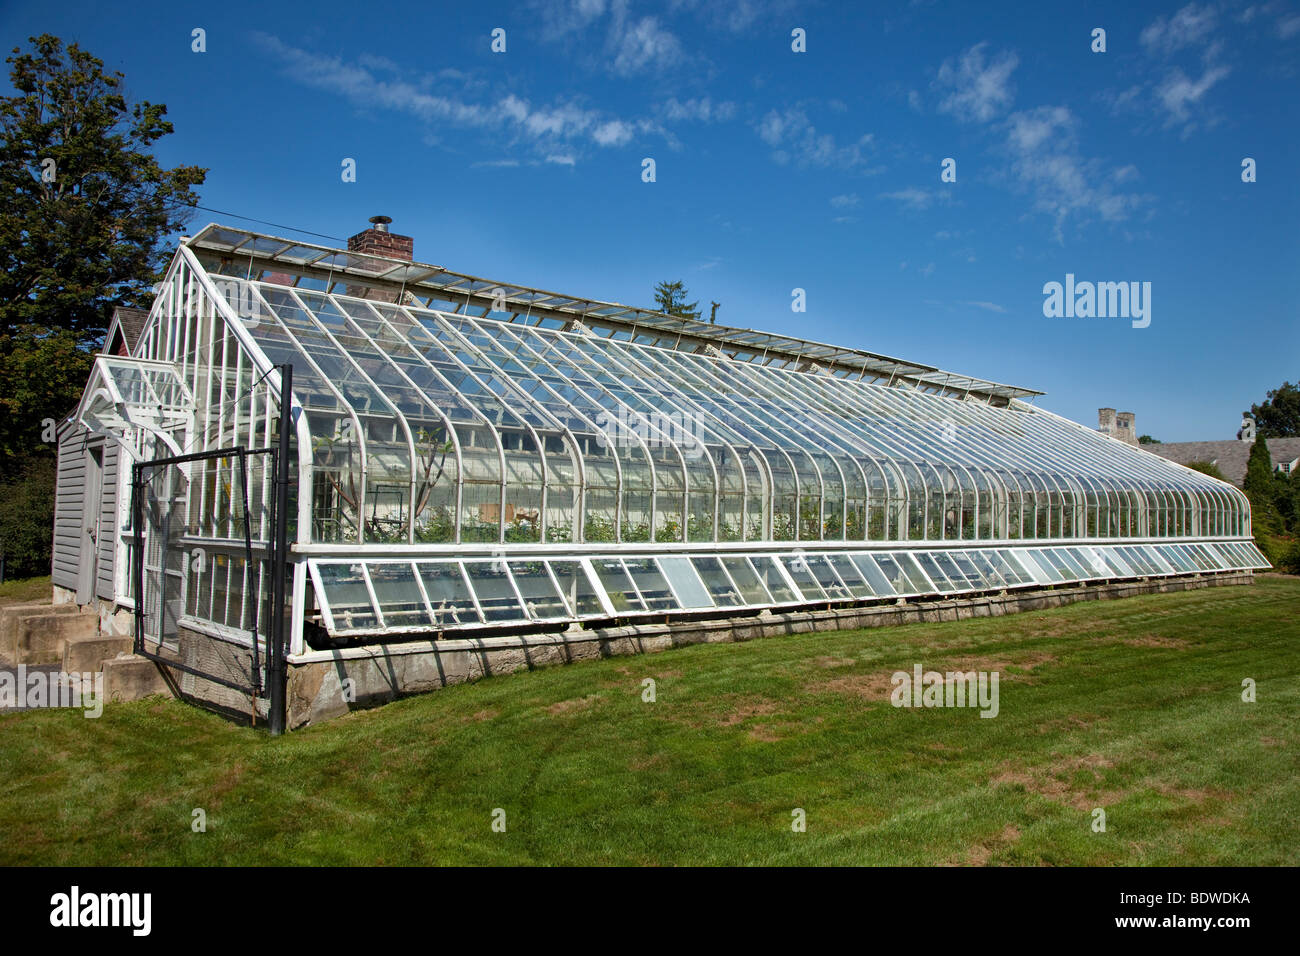 Greenhouse Ventilation Stock Photos & Greenhouse Ventilation Stock ...